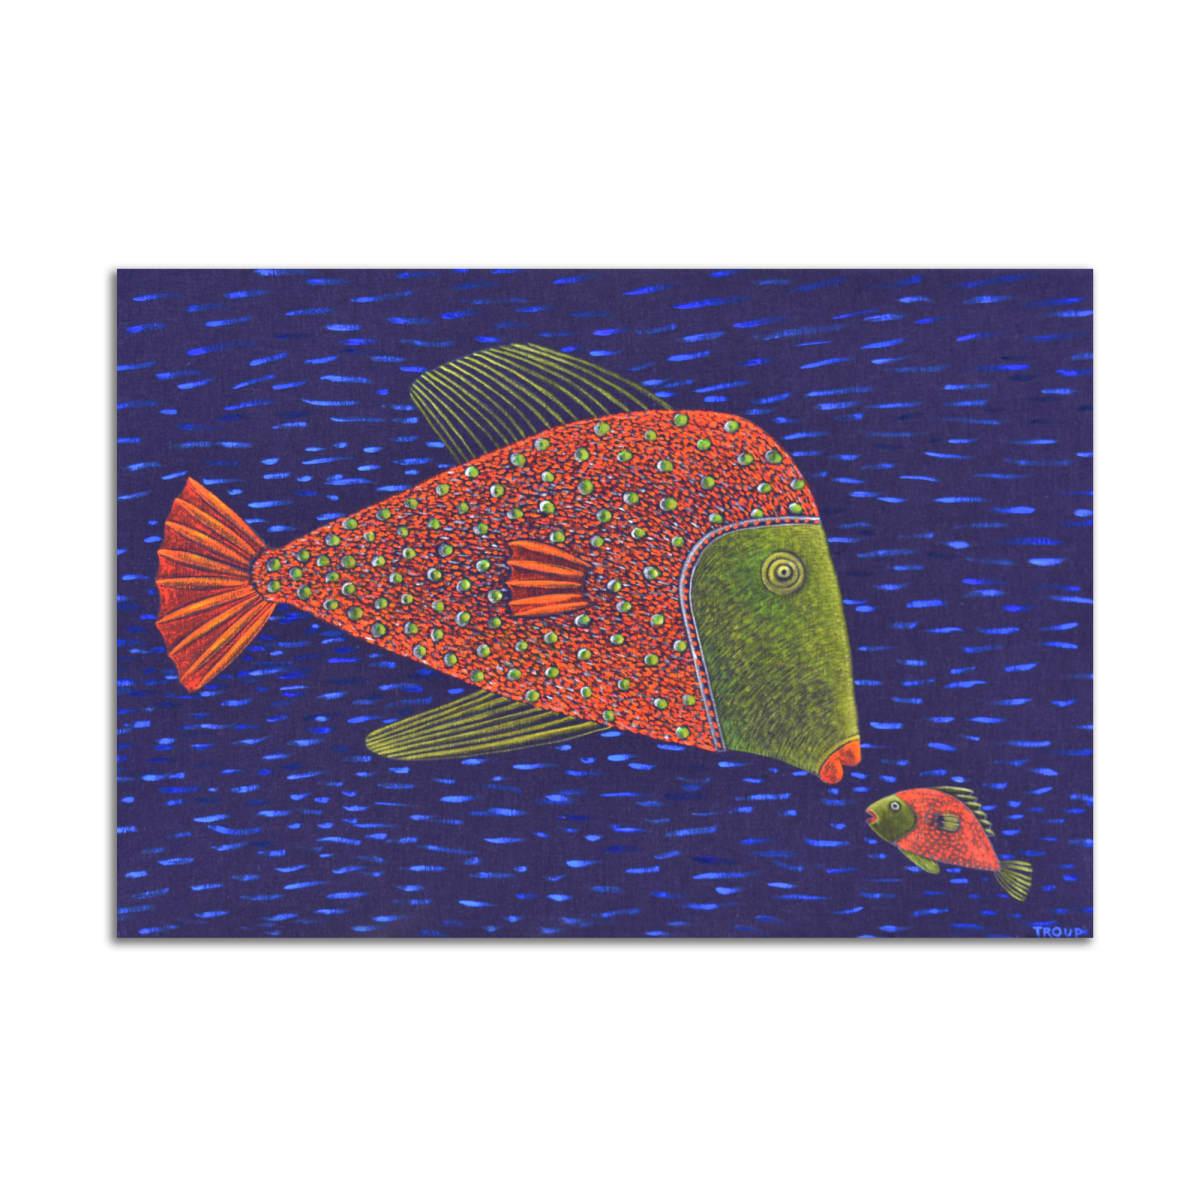 Big Fish, Little Fish by Jane Troup